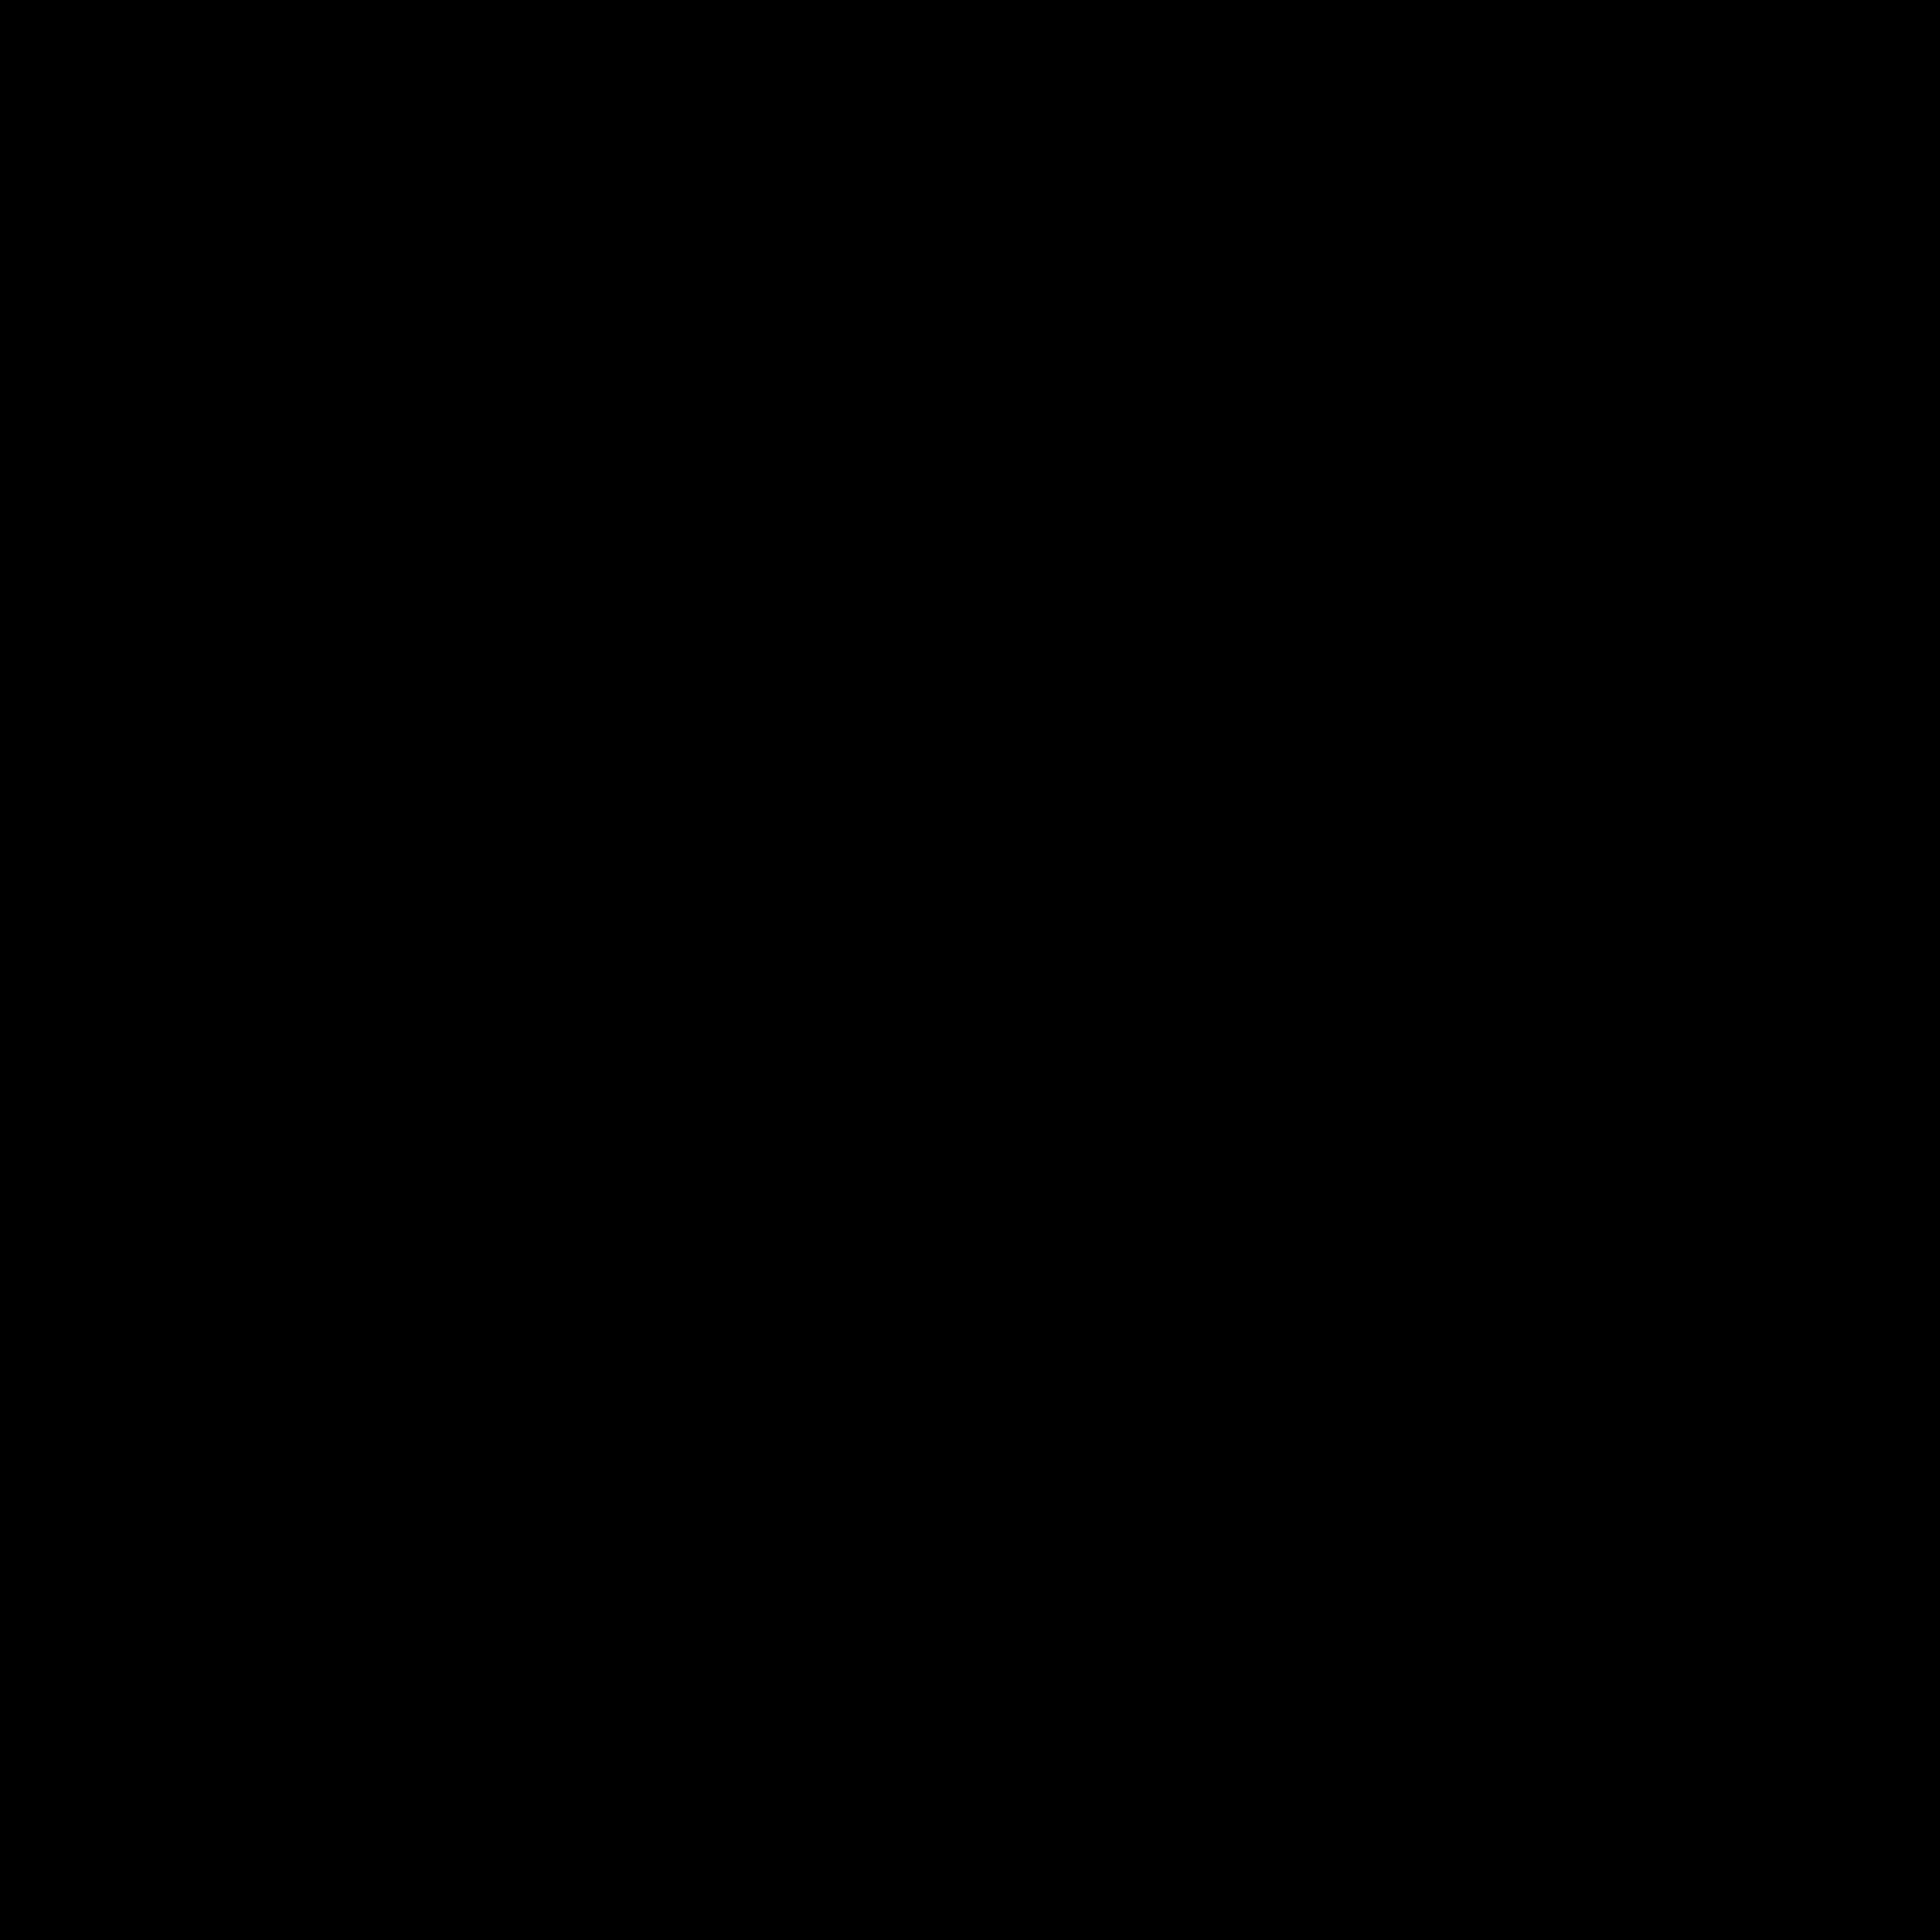 Monochrome clipart turkey And White Black  Happy